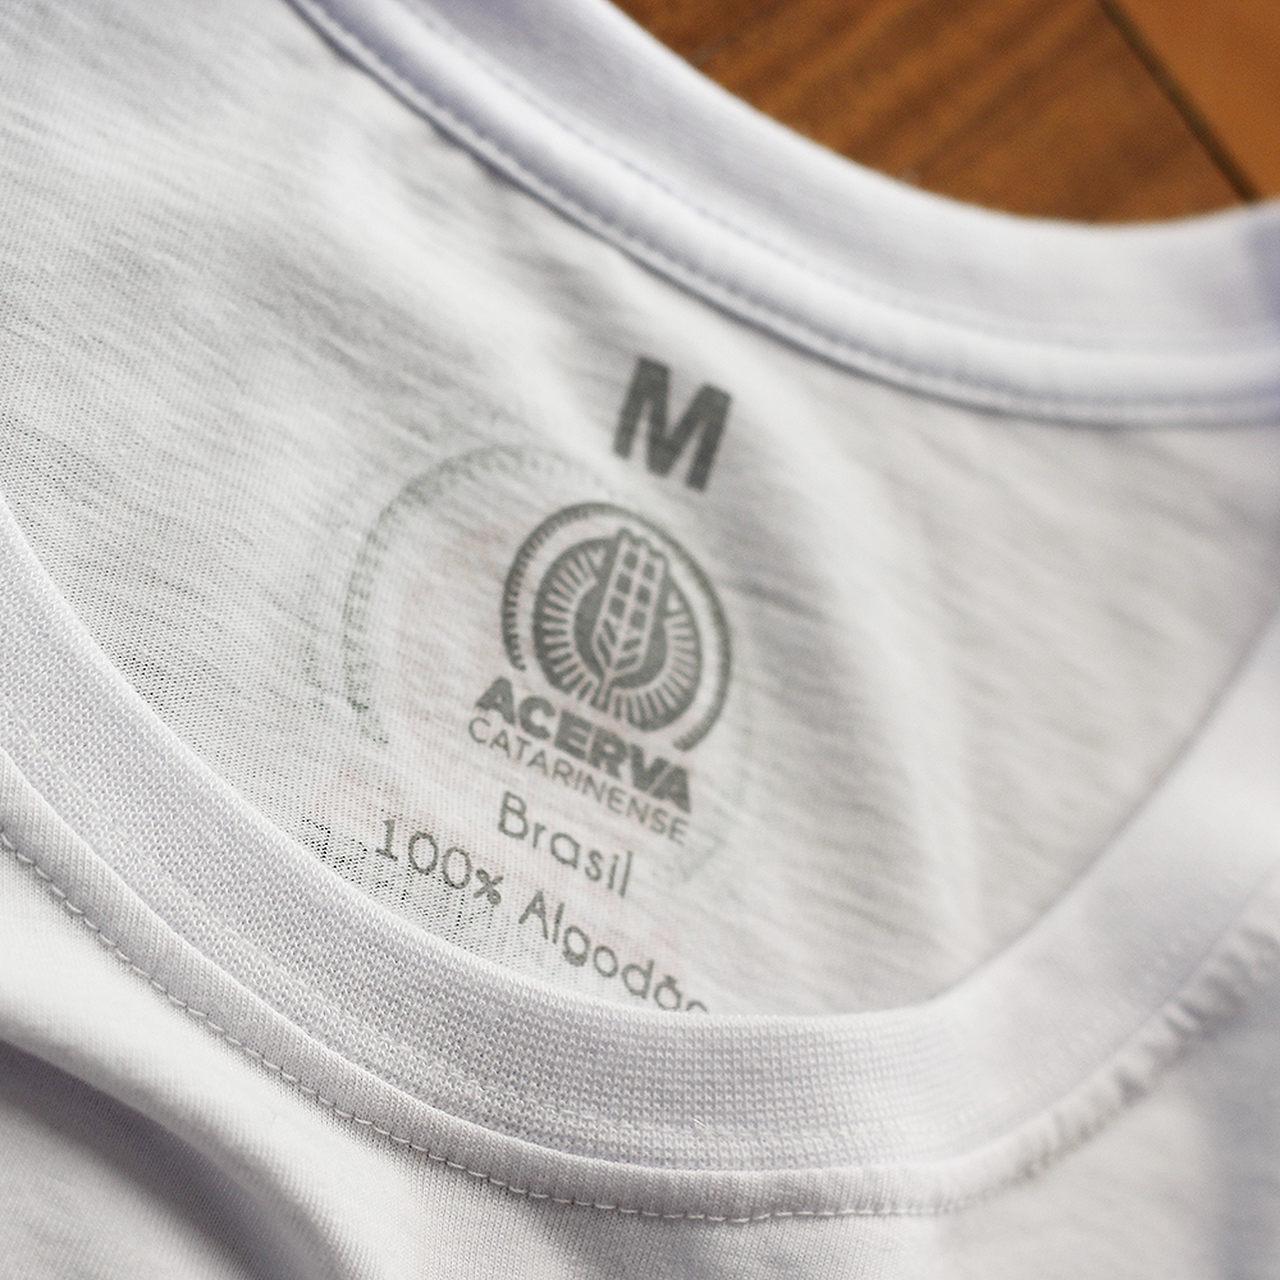 Camiseta Baby Look Acerva Catarinense Branco  - Maria Cervejeira